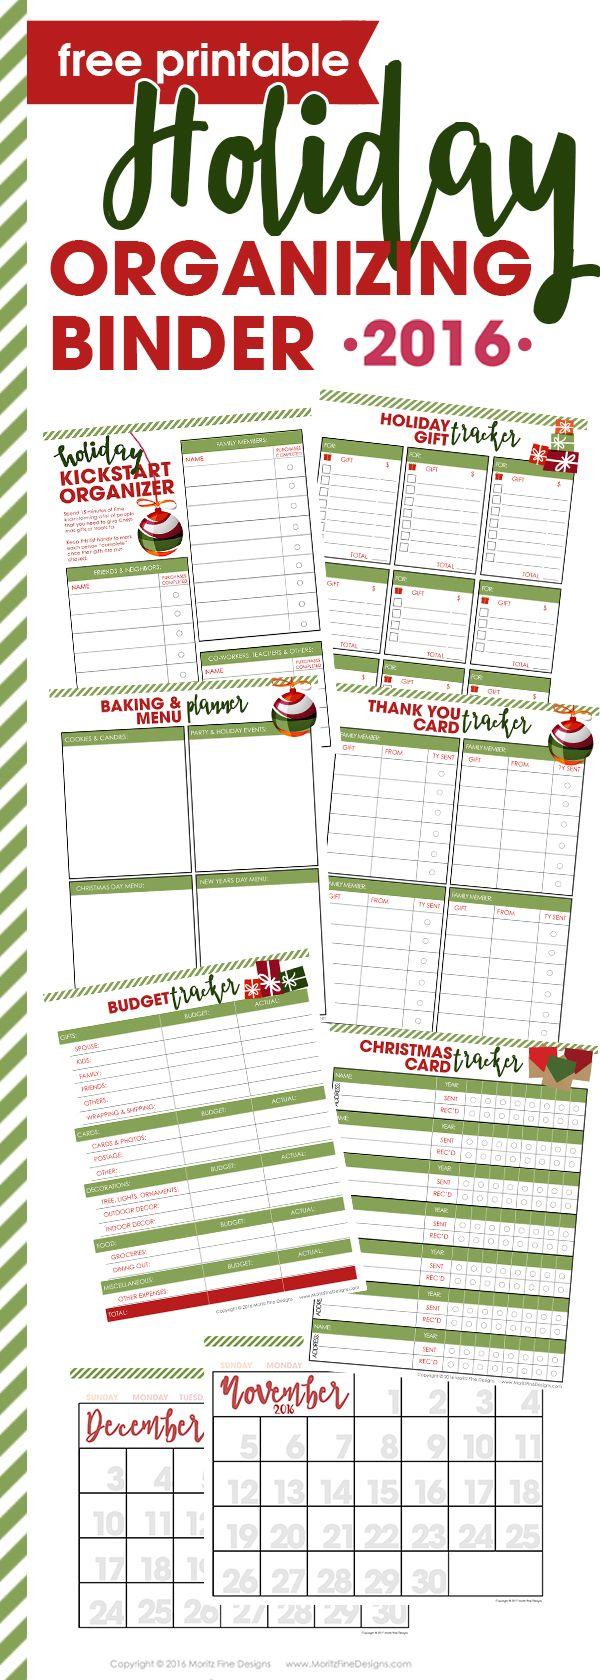 Ready to enjoy a stress-free holiday season? Plan, prepare and execute a fantastic holiday season with the free printable 2016 Holiday Organizing Binder.